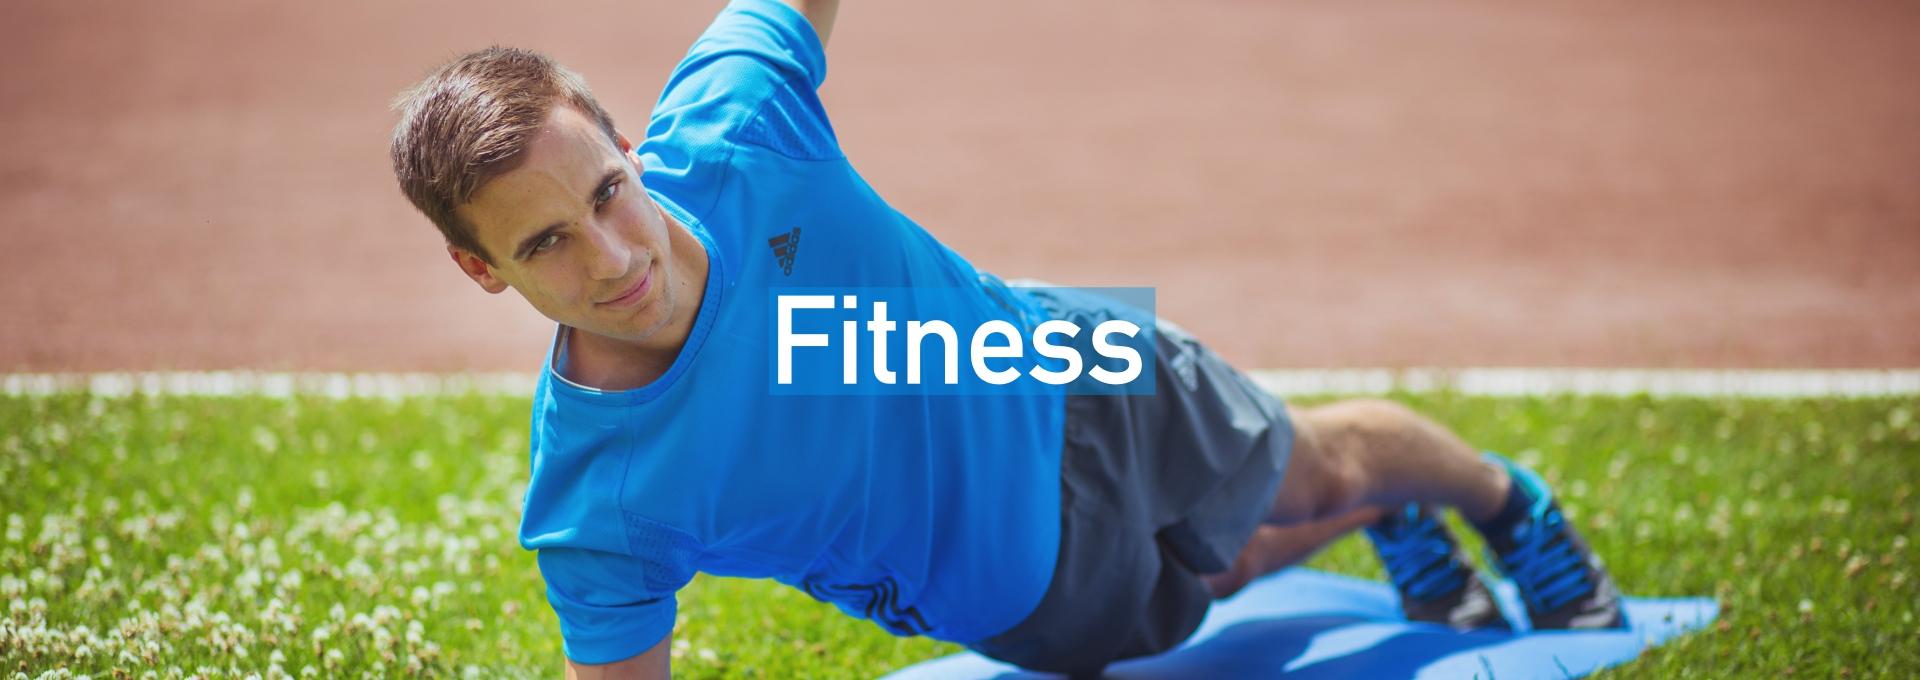 Fitness-2.1.1